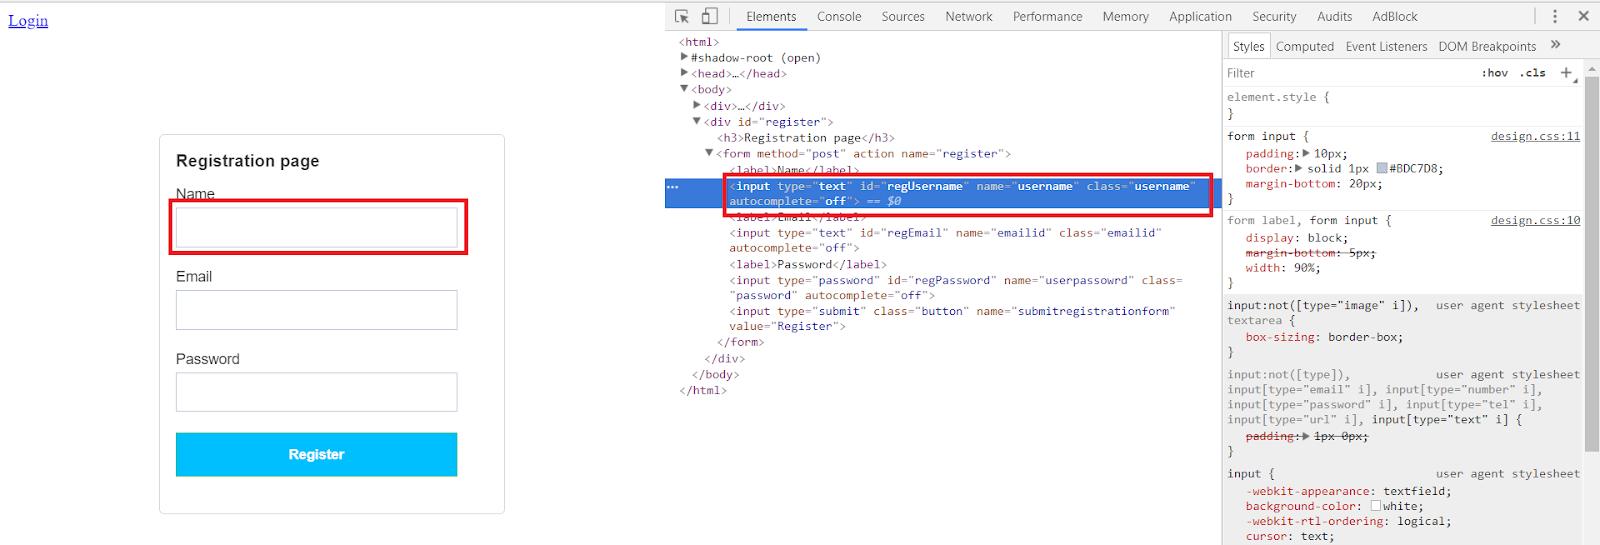 CSS Selectors in Selenium WebDriver with Examples   SKPTRICKS